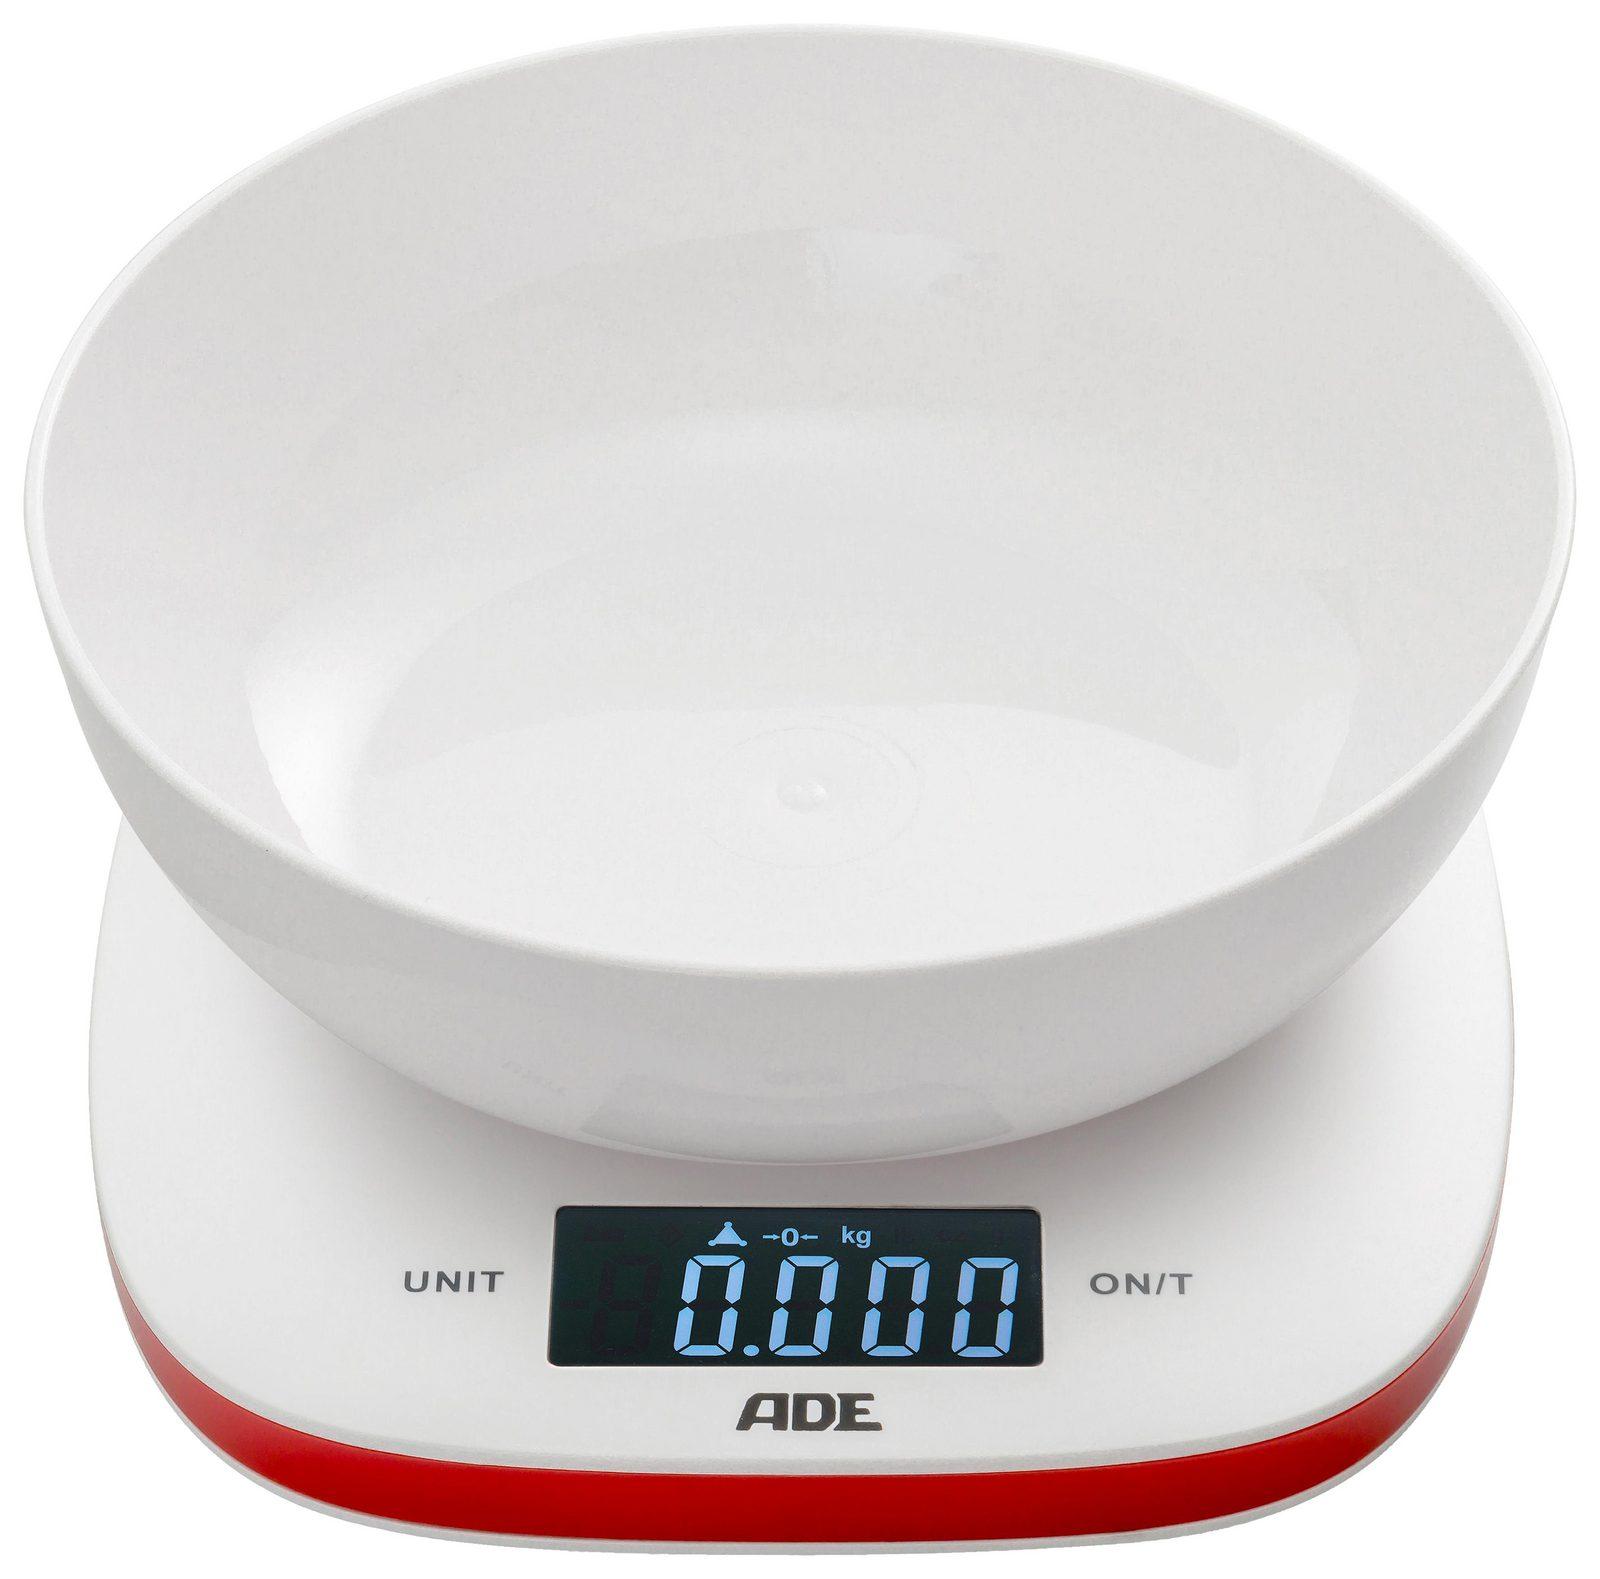 ADE Digitale Schüsselwaage »KE1412 Amelie« jetztbilligerkaufen